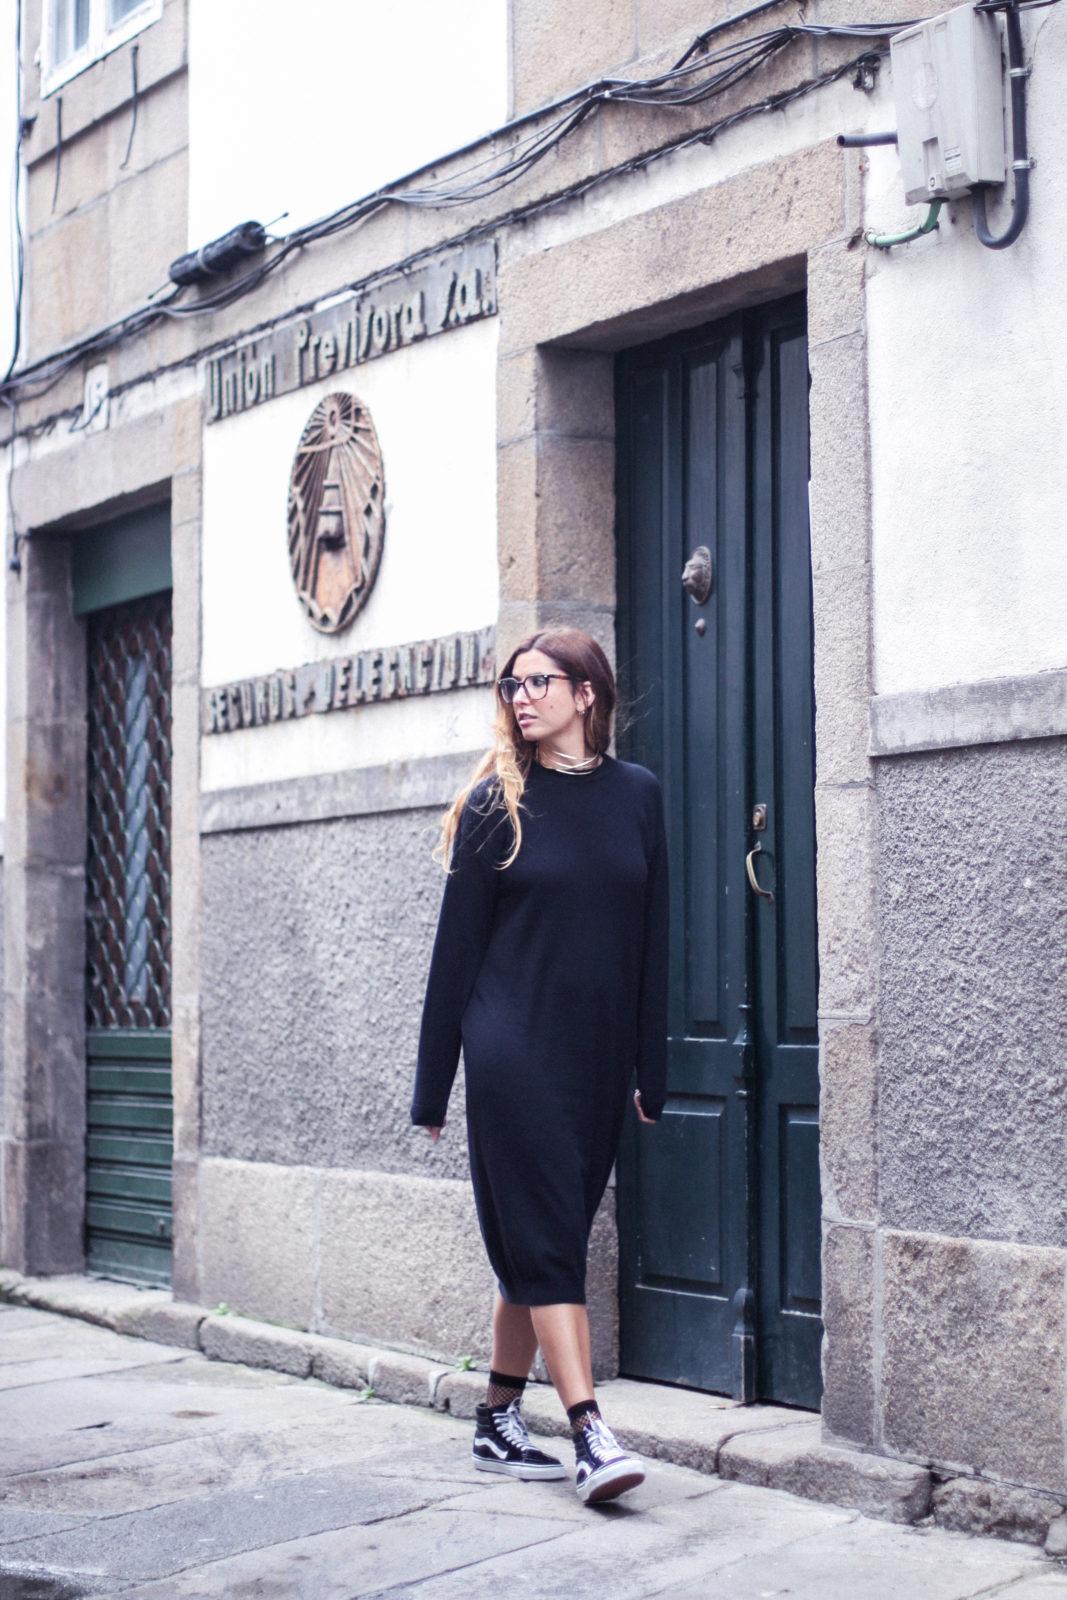 vestido_de_punto_midi_vans_calcetines_rejilla_choker_metalico_happiness_boutique_abrigo_largo_gucci_street_style_fall_2016_donkeycool-37